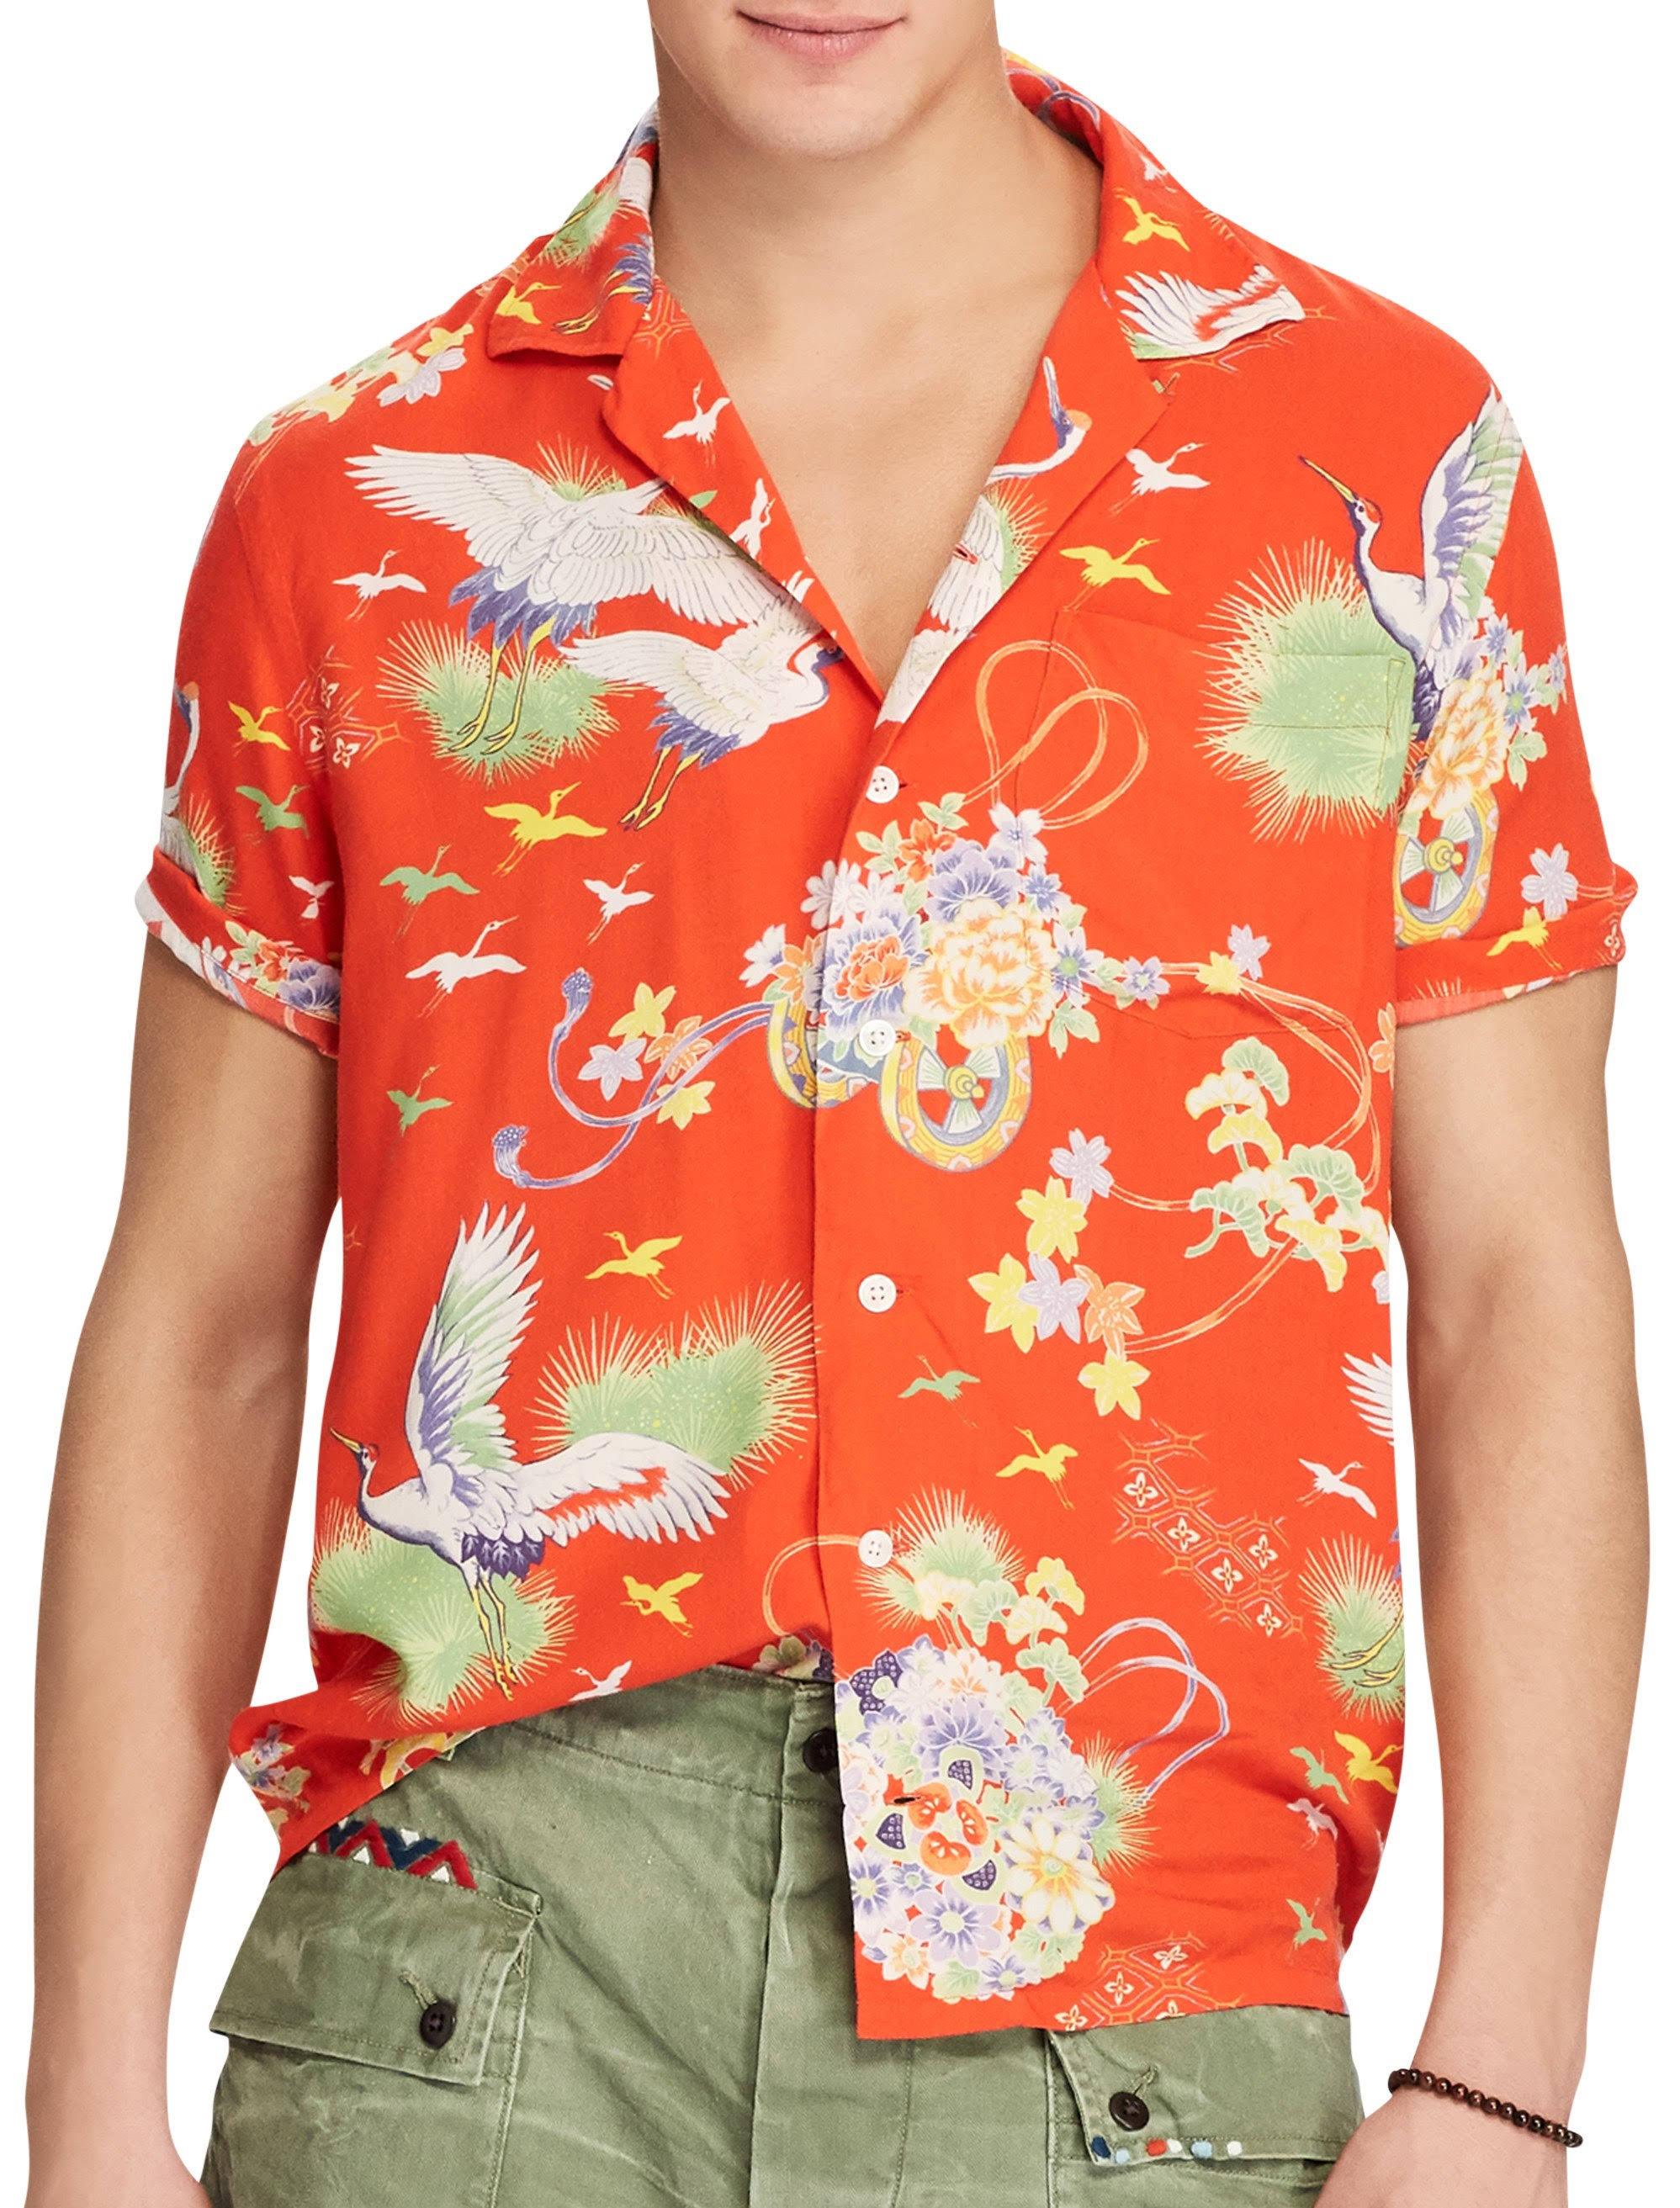 Hombres 145 Shirt Polo Orange Lauren Luau 2xlt Hawaiian Camp Ralph Tropical XqAZUww